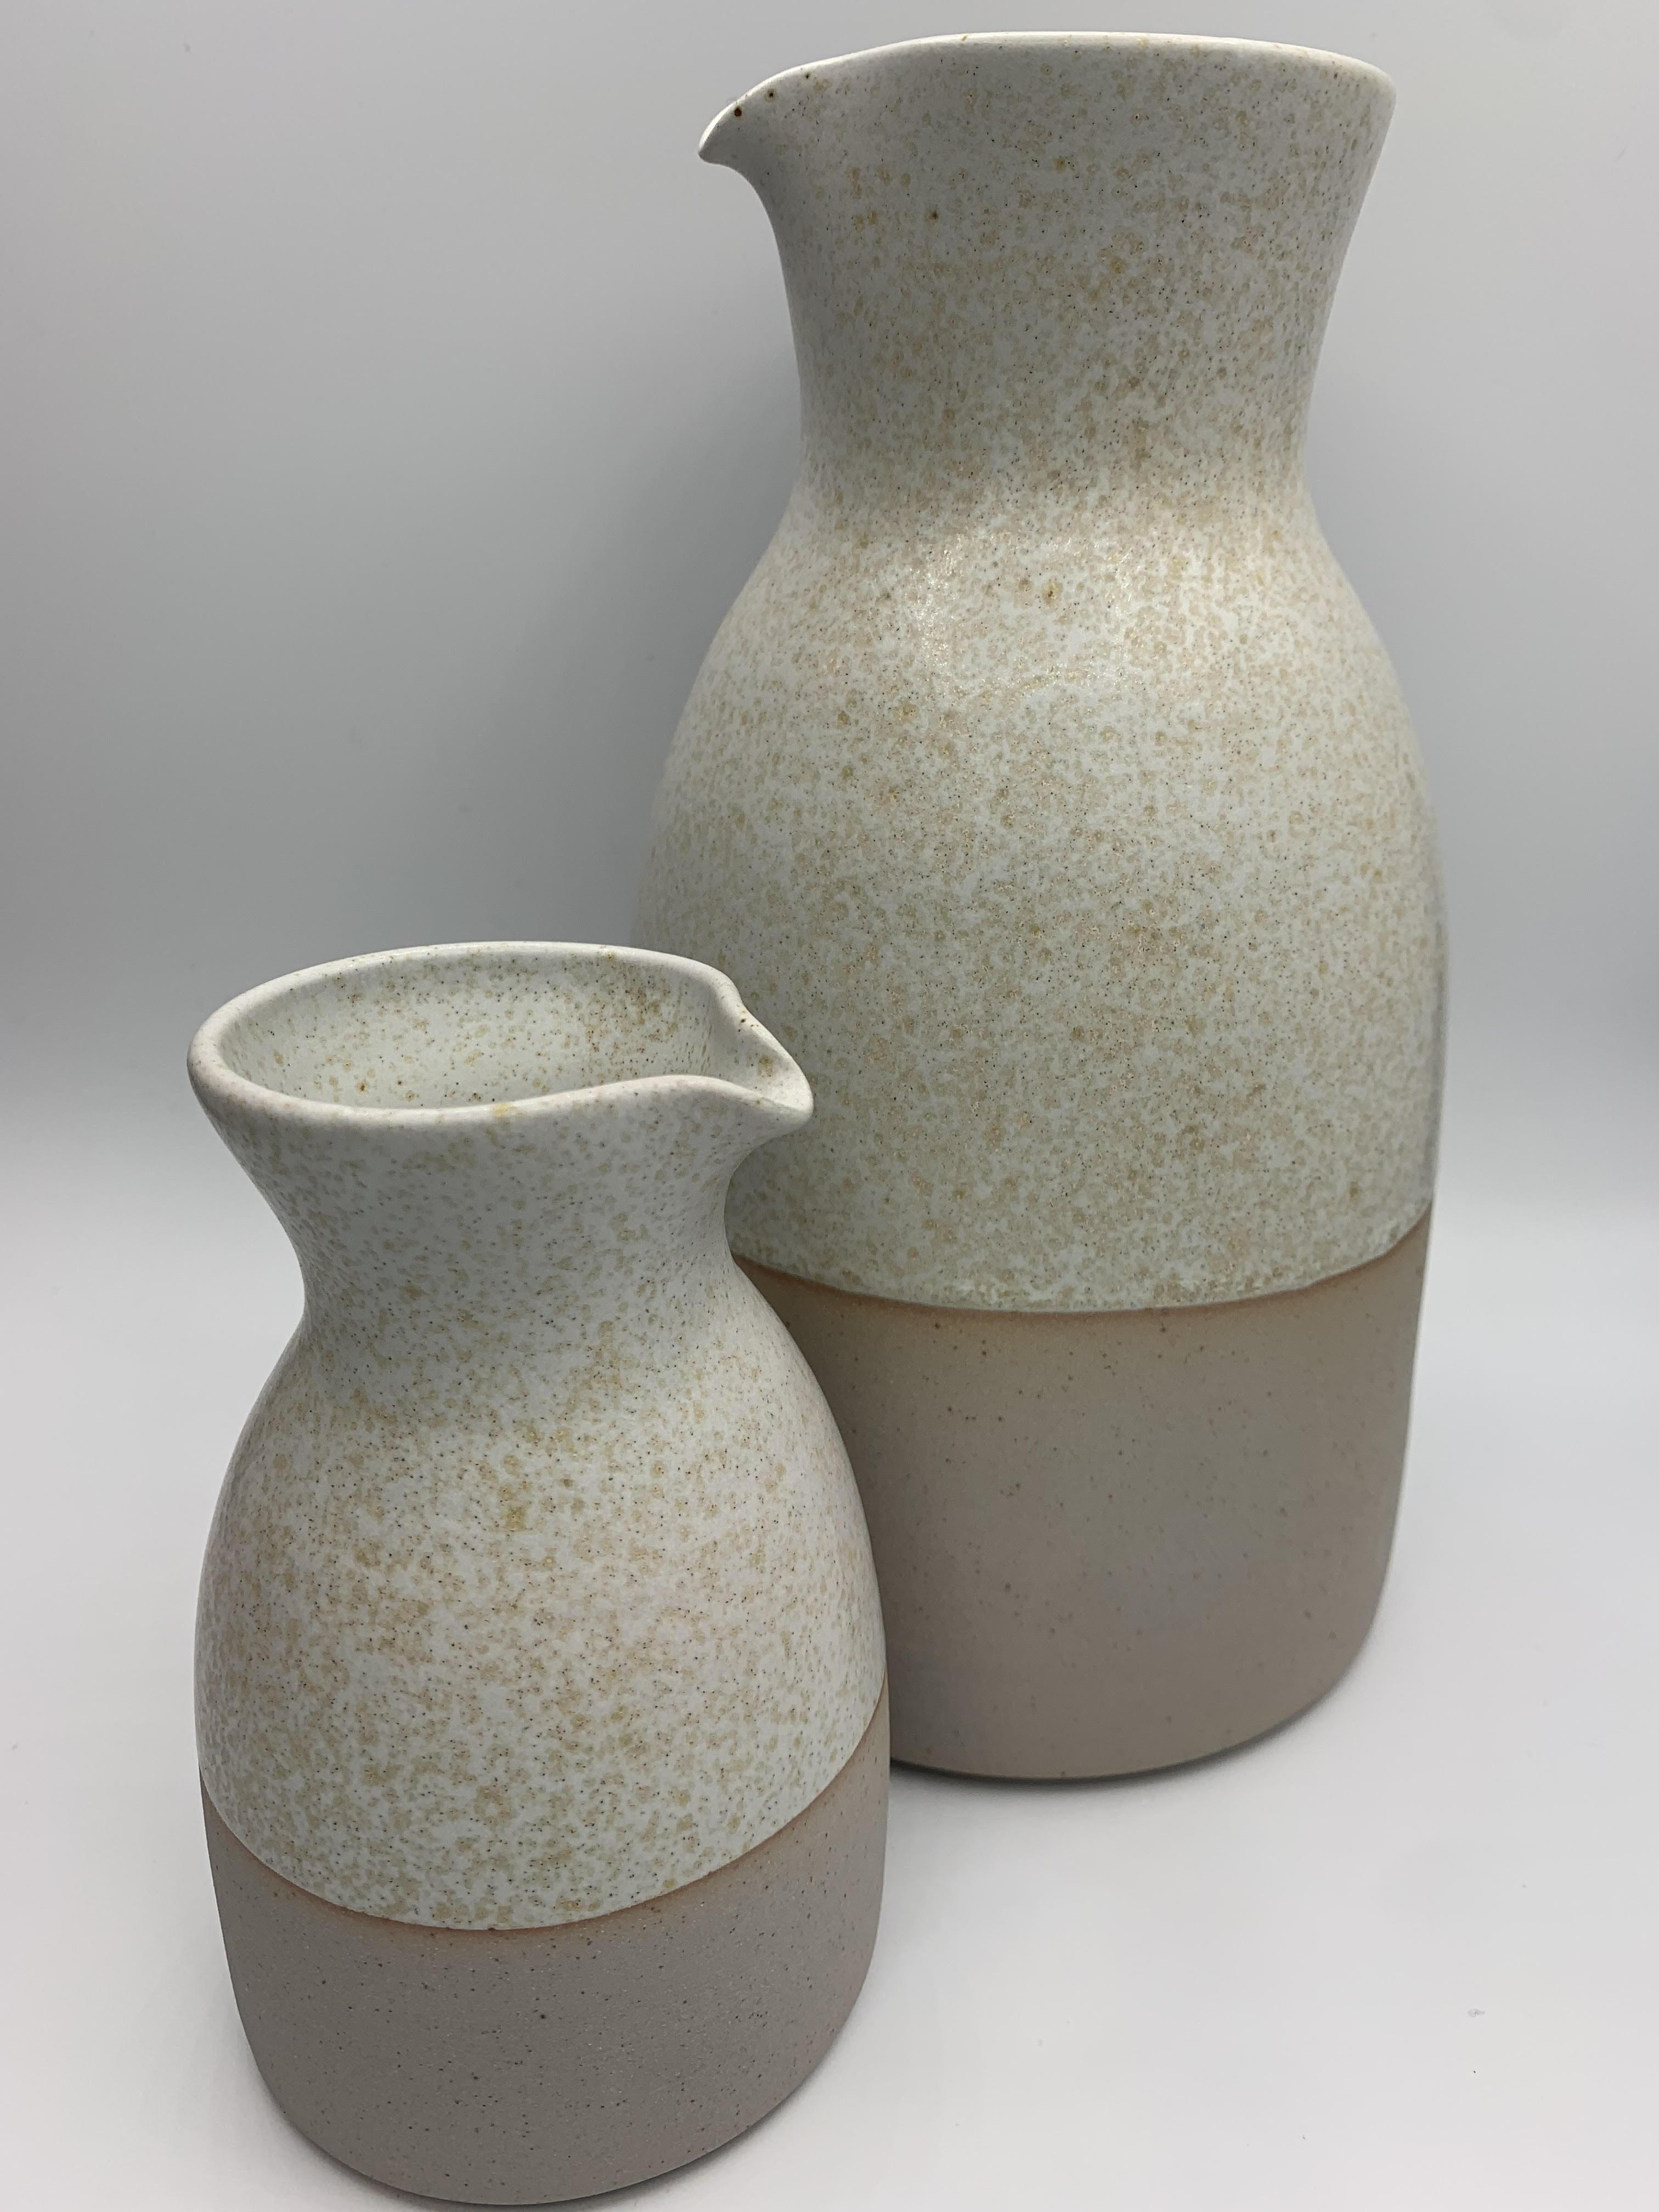 ceramic carafe/jug